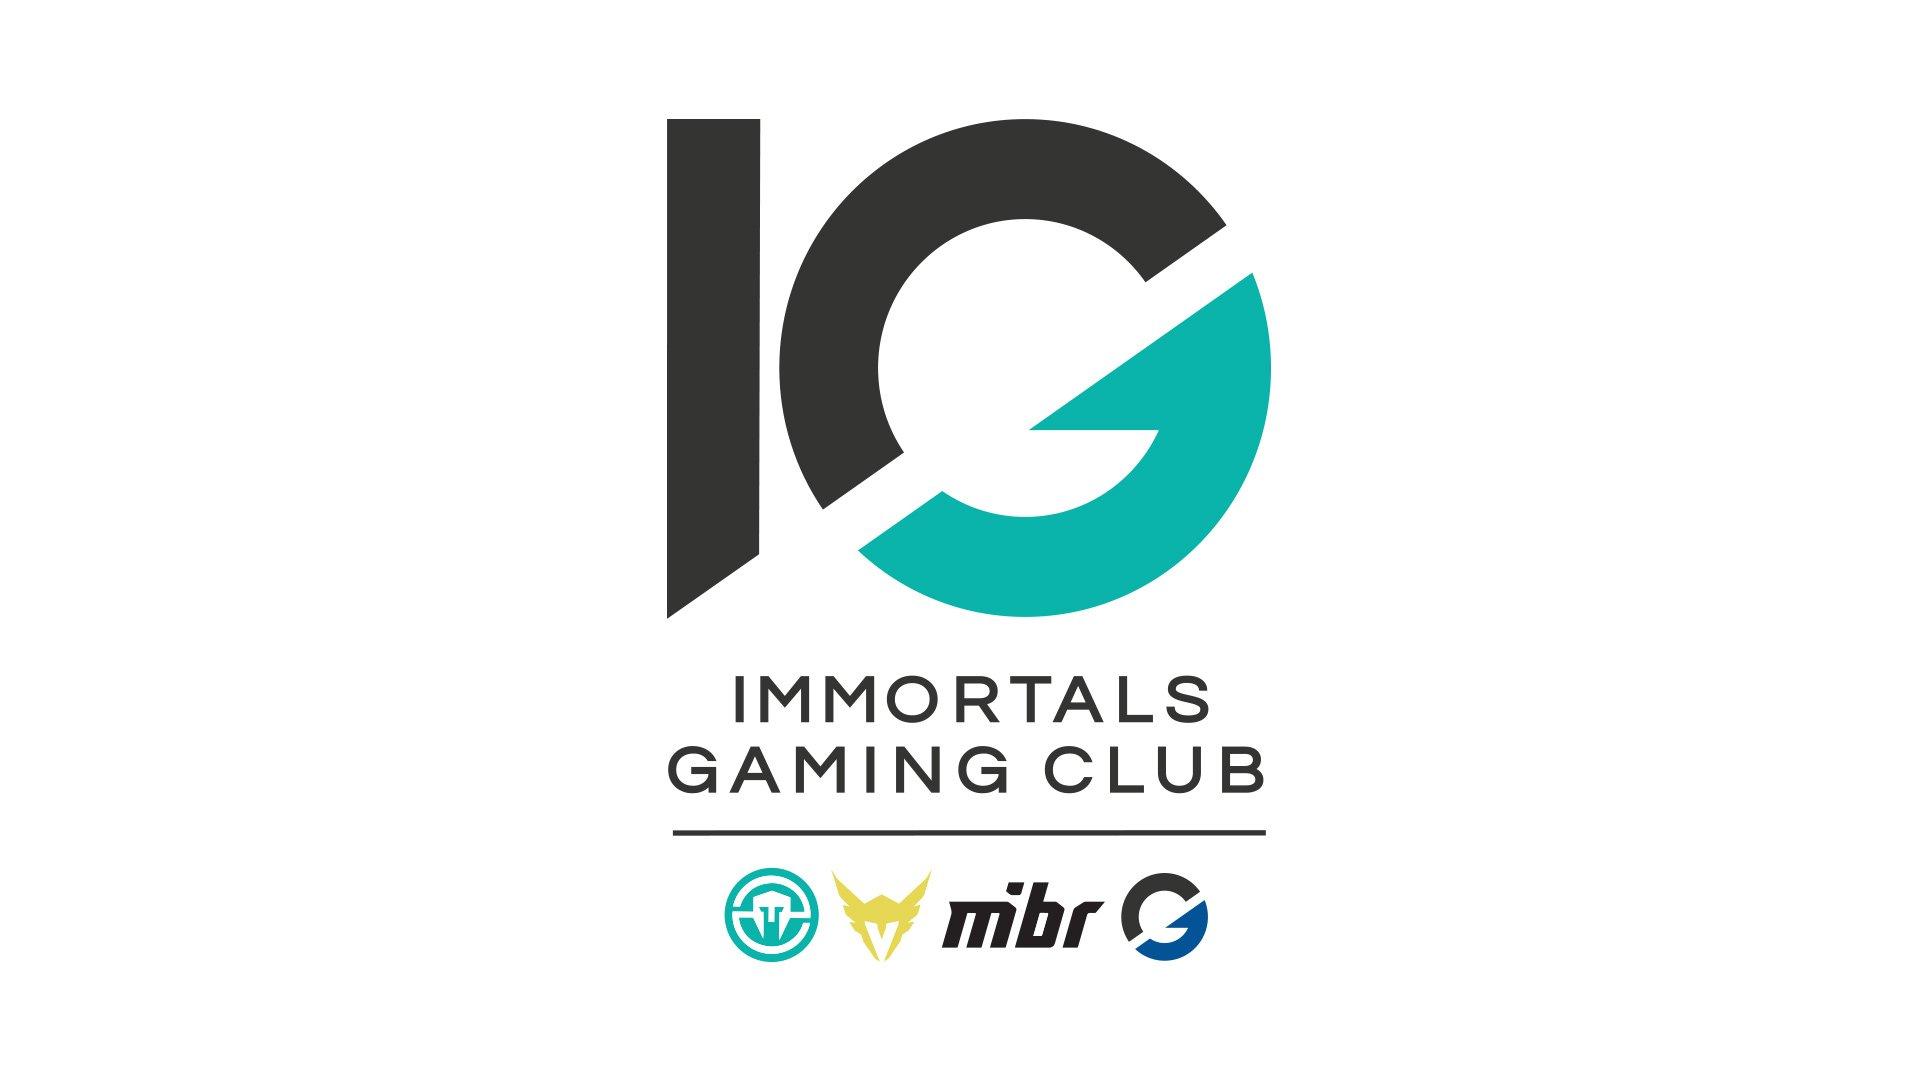 Immortals Raises 30 Million In Series B Funding Rebrands